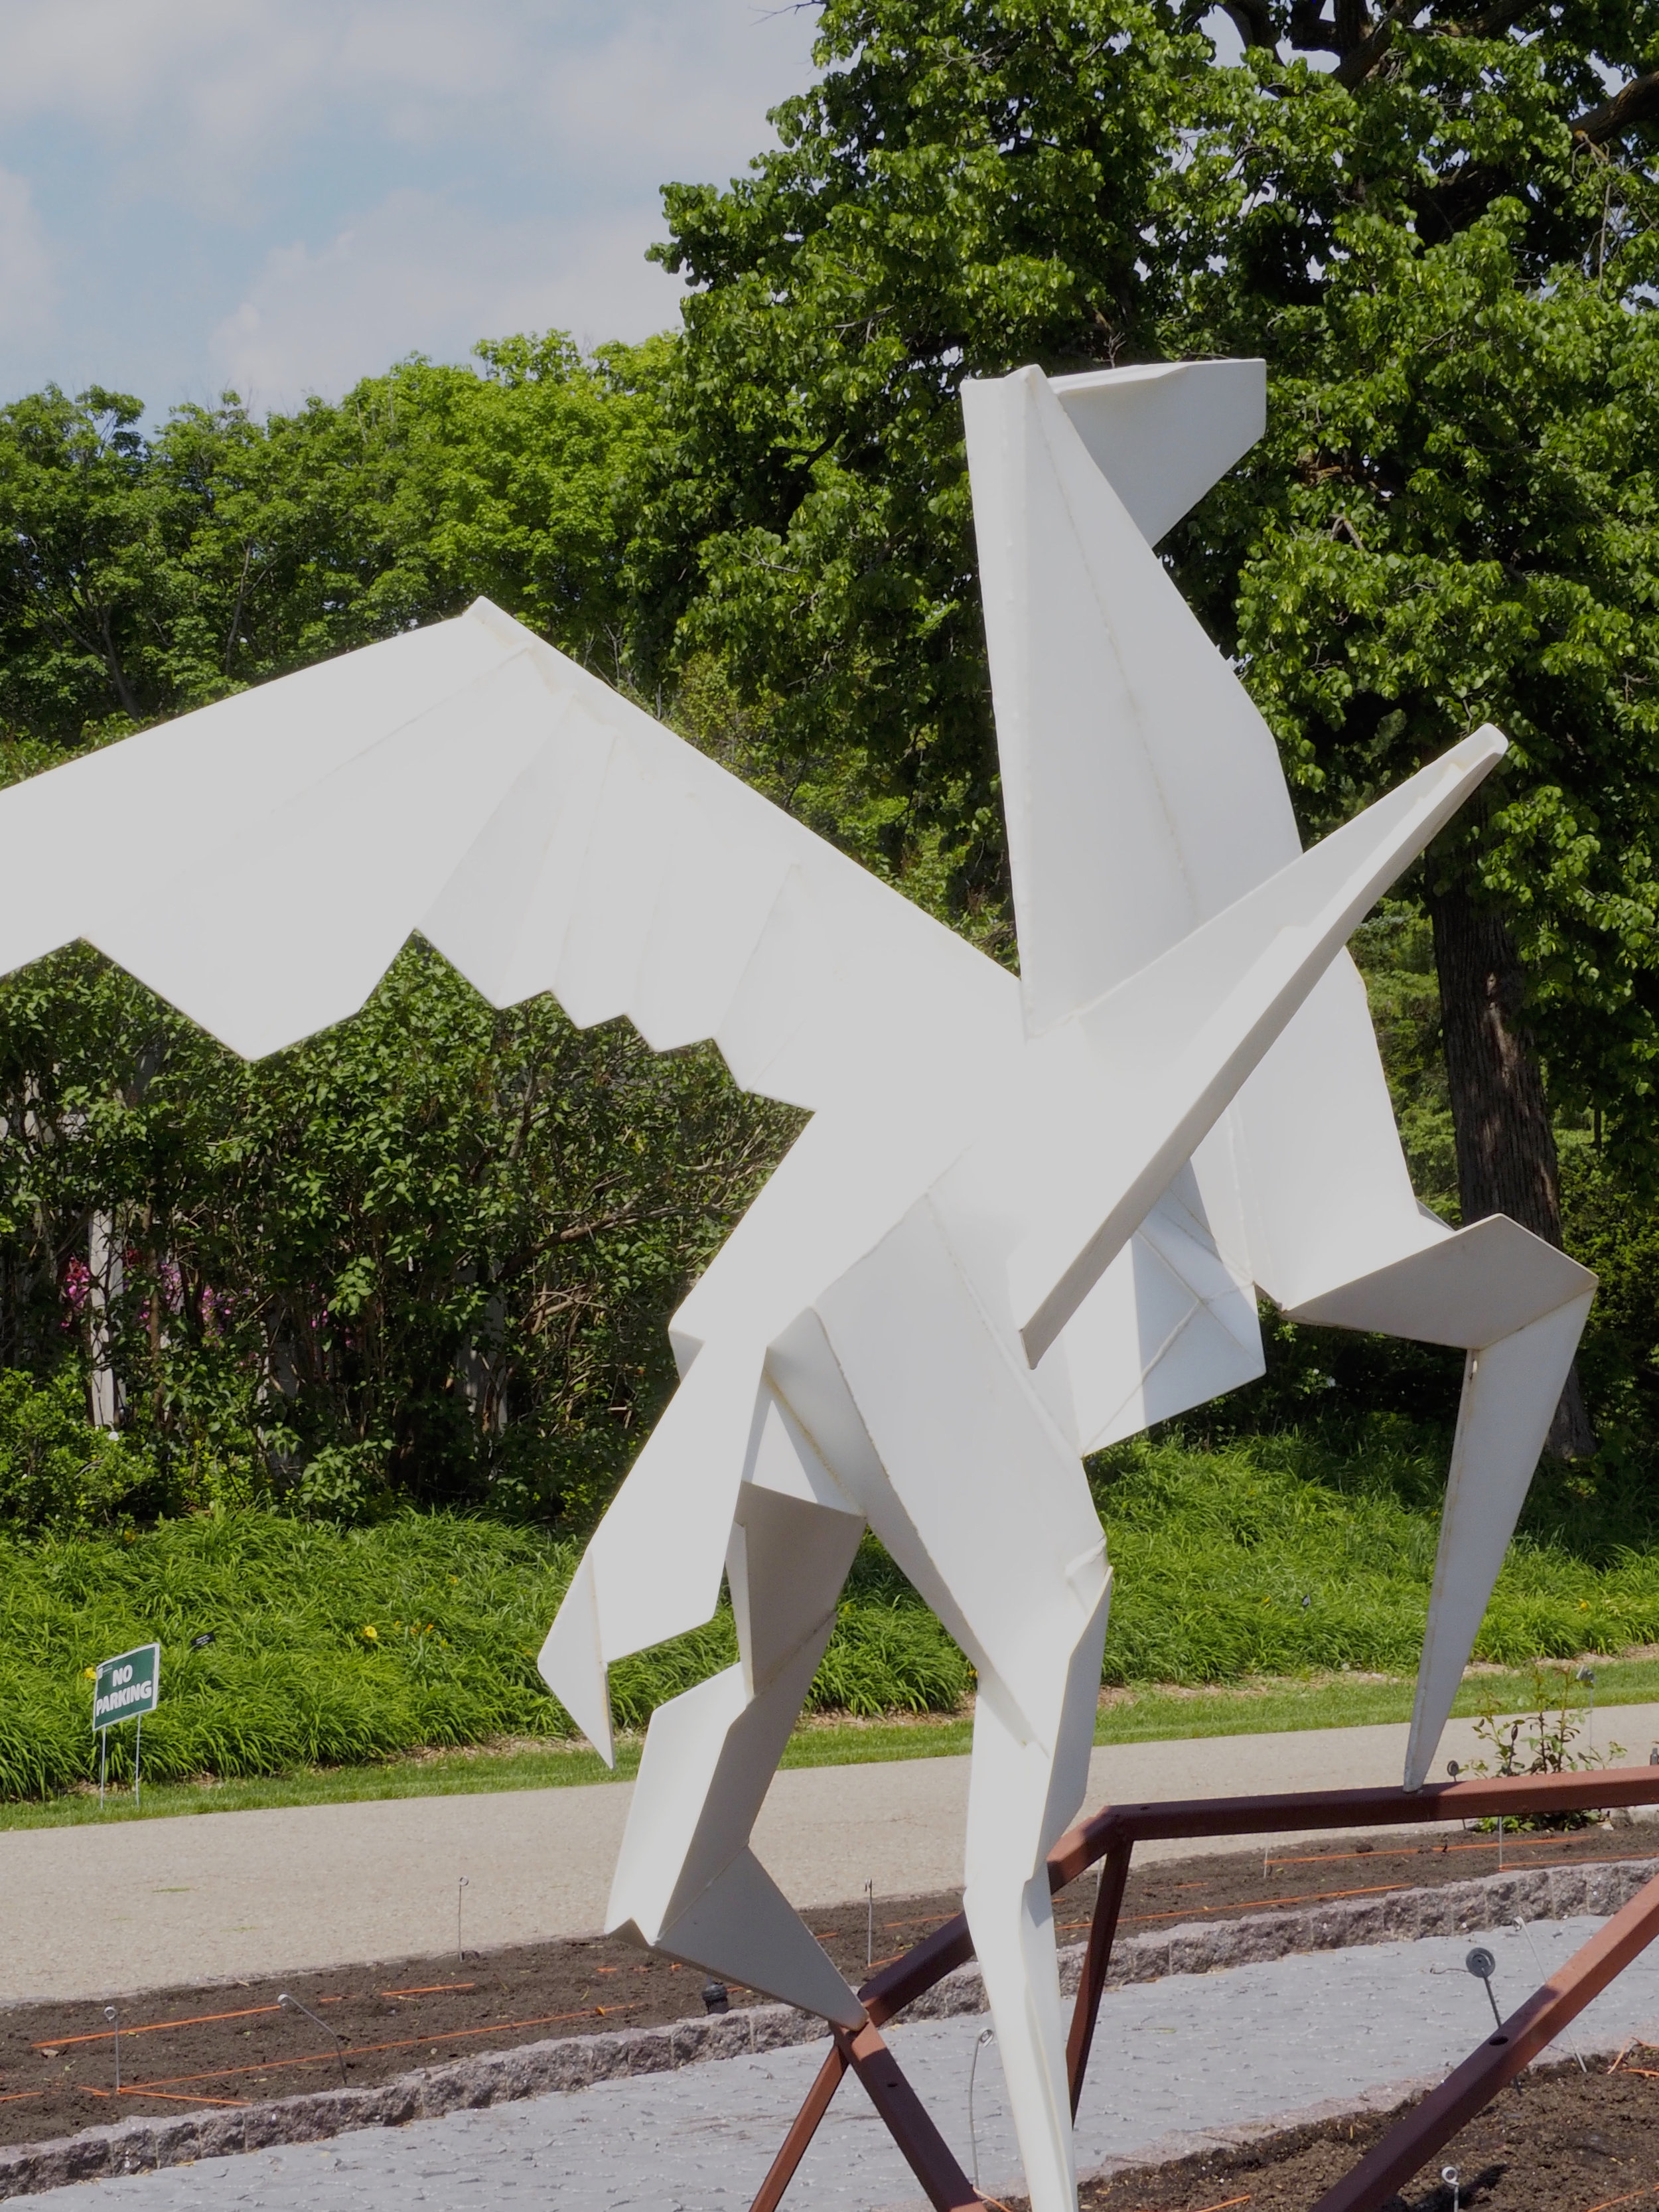 cindi_arboretum_origami_spiritedtable_photo18.jpg